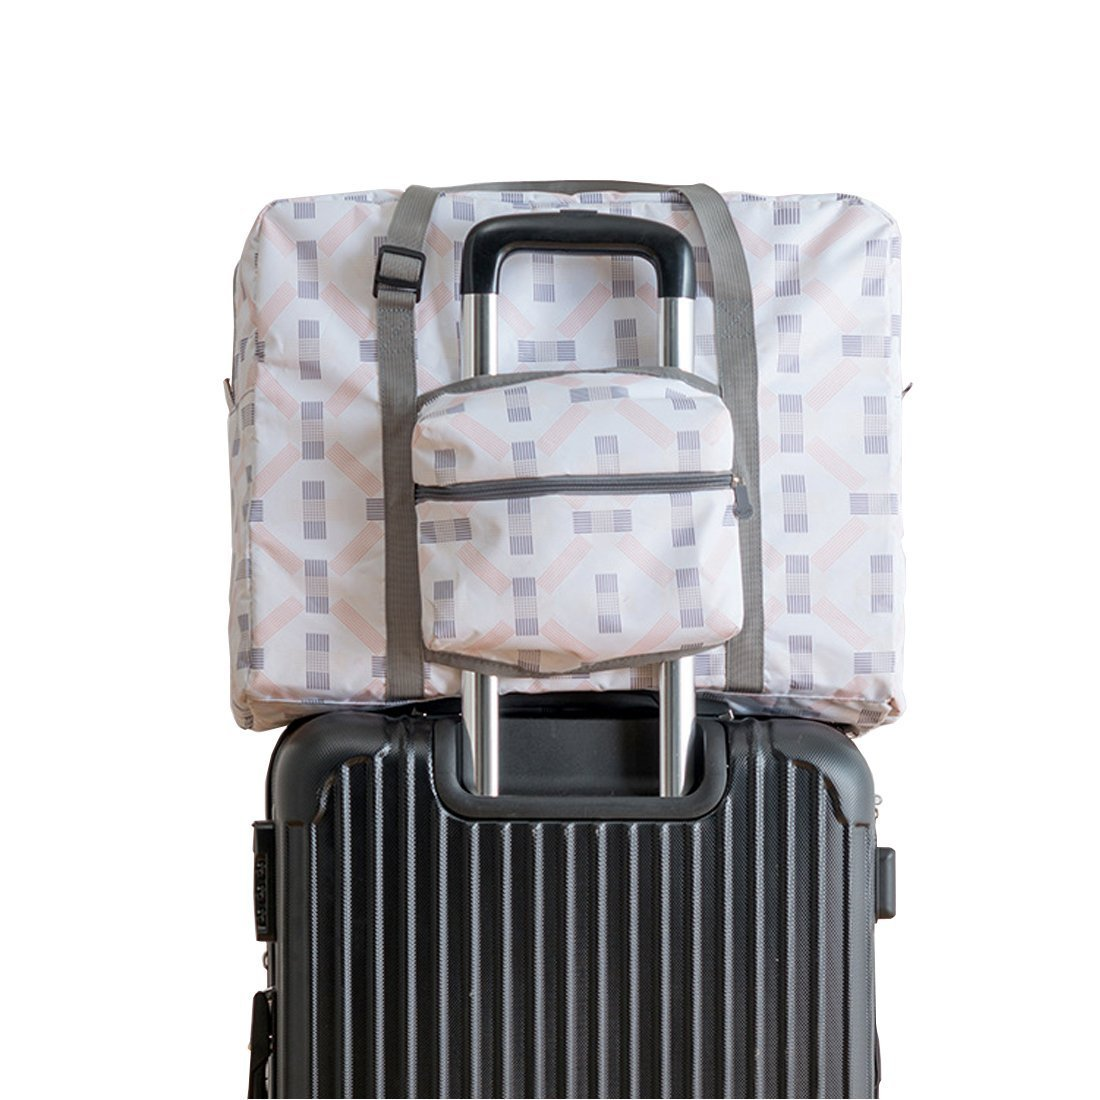 Travel Luggage Bag Waterproof Reusable Folding Large Capacity Carry Storage Tote Bag